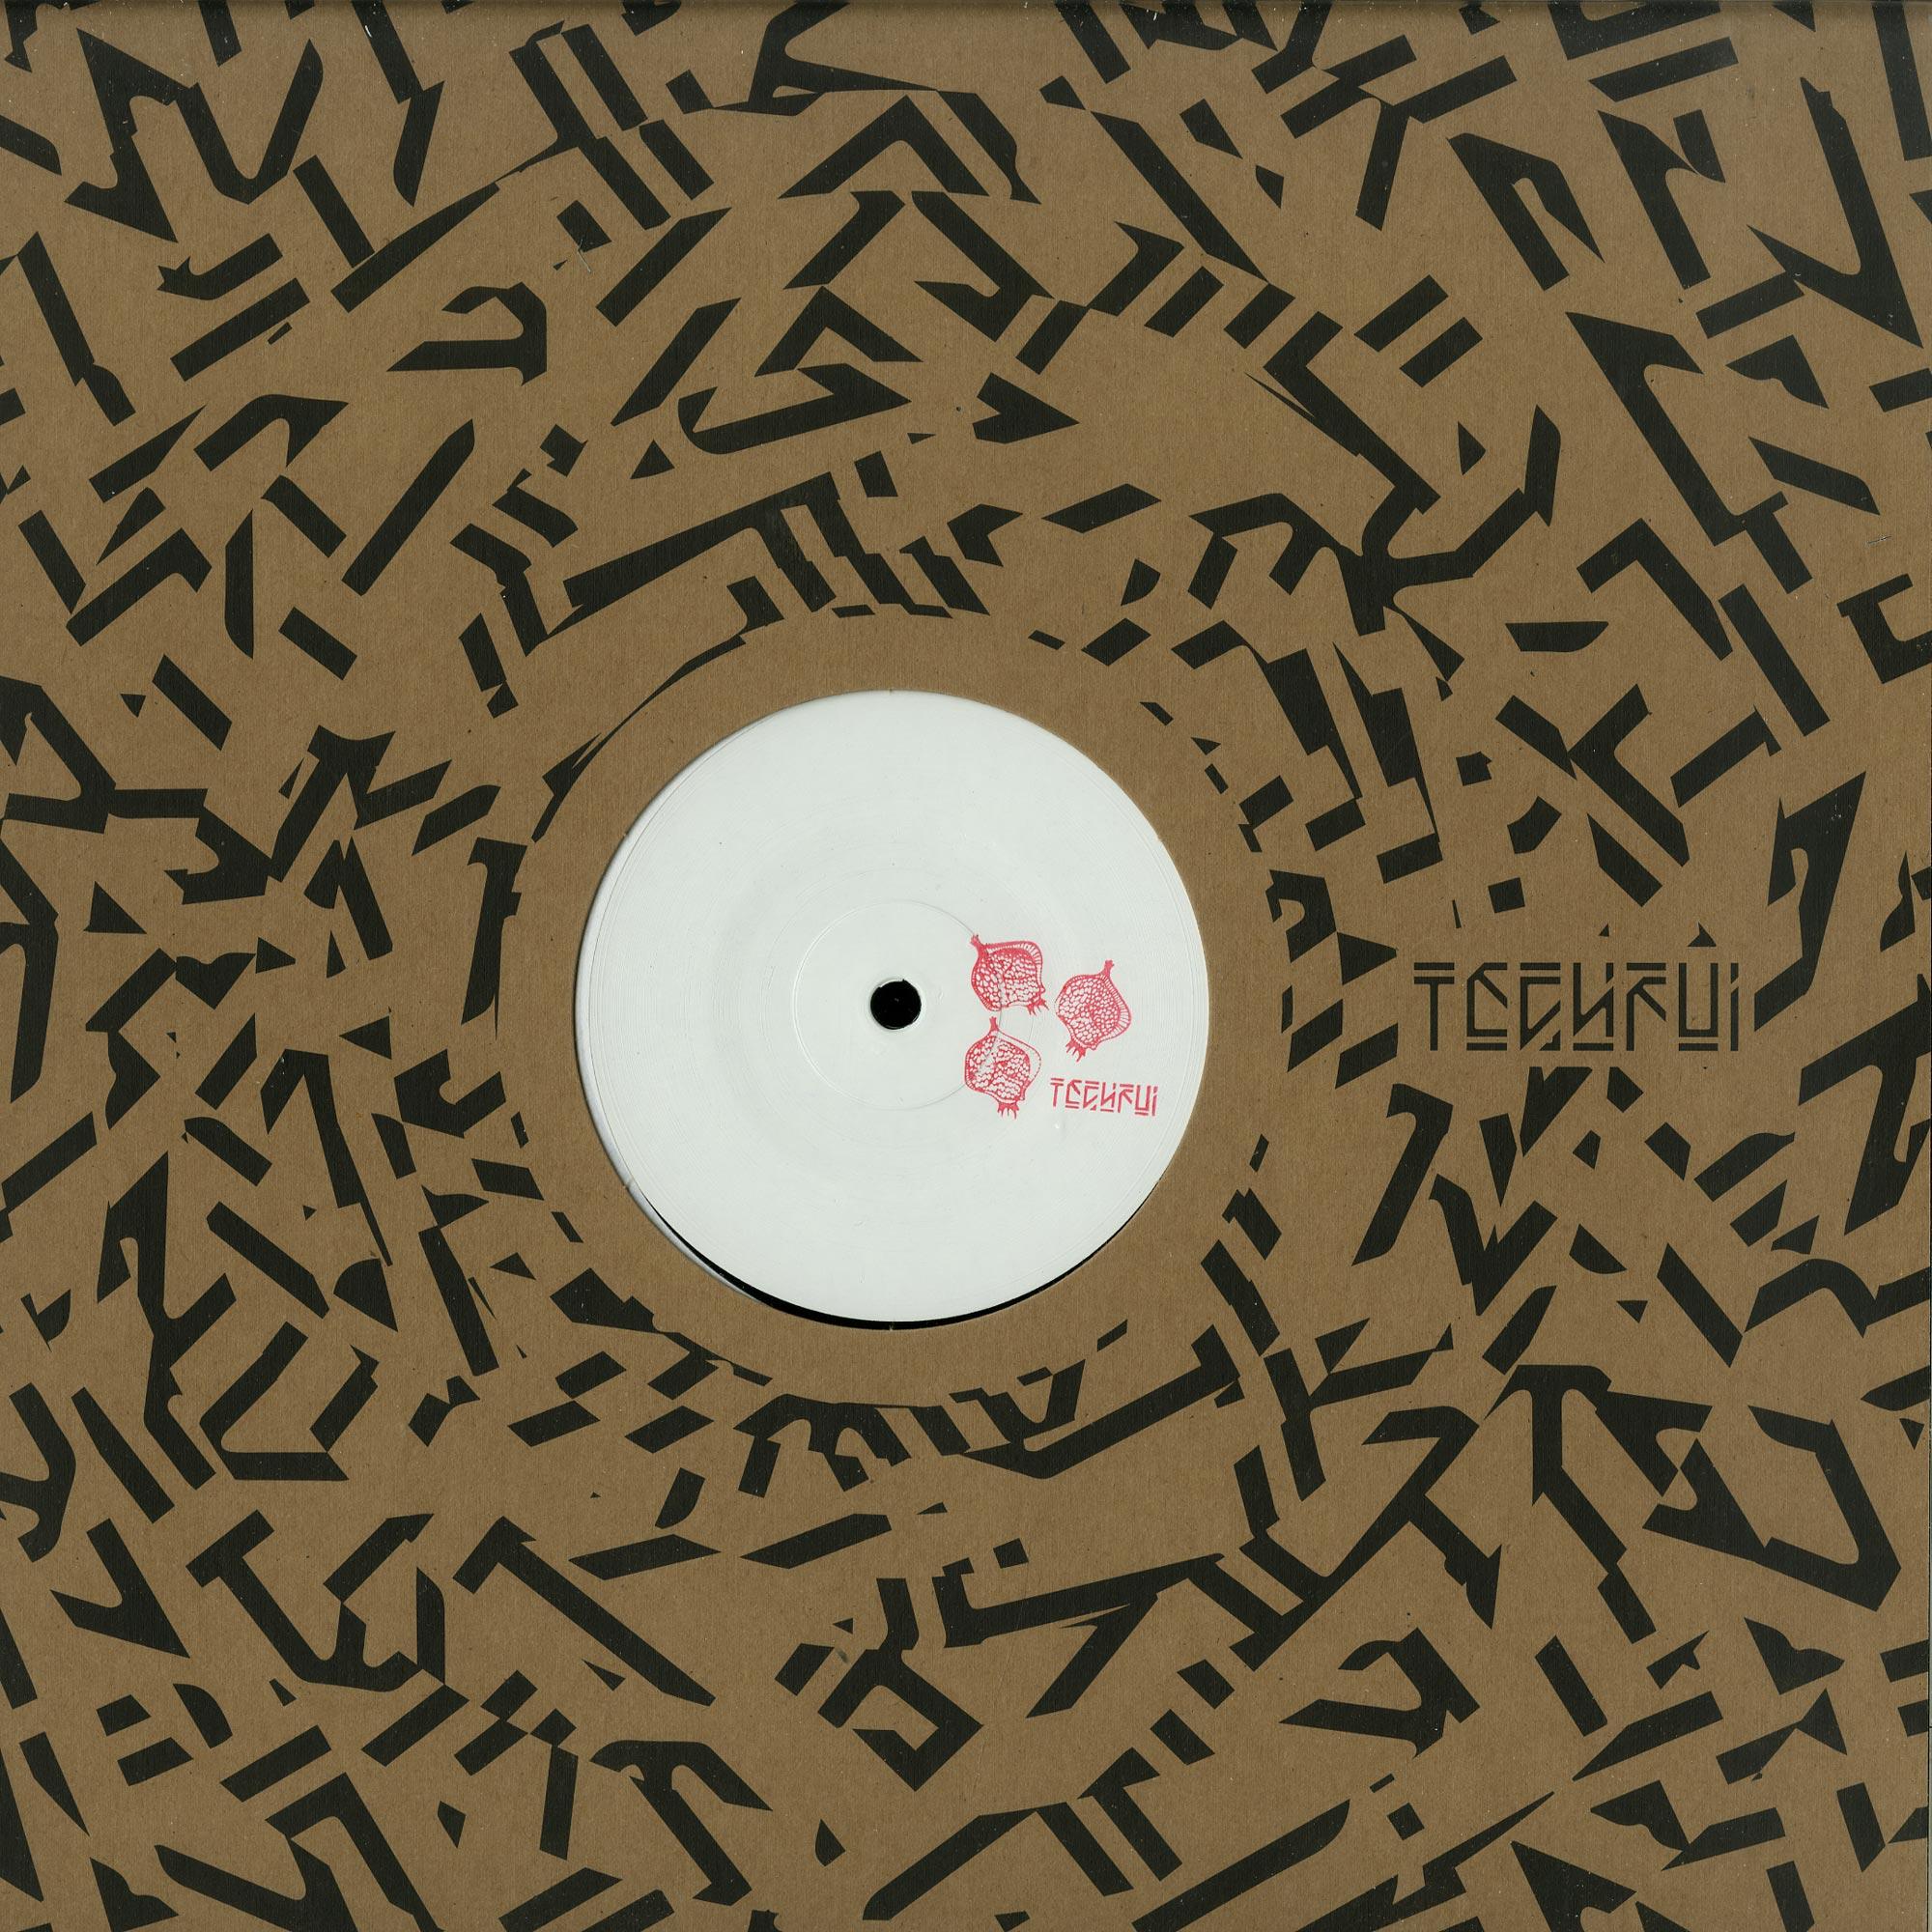 Sonnen Blumen Kerne - GINKO EP